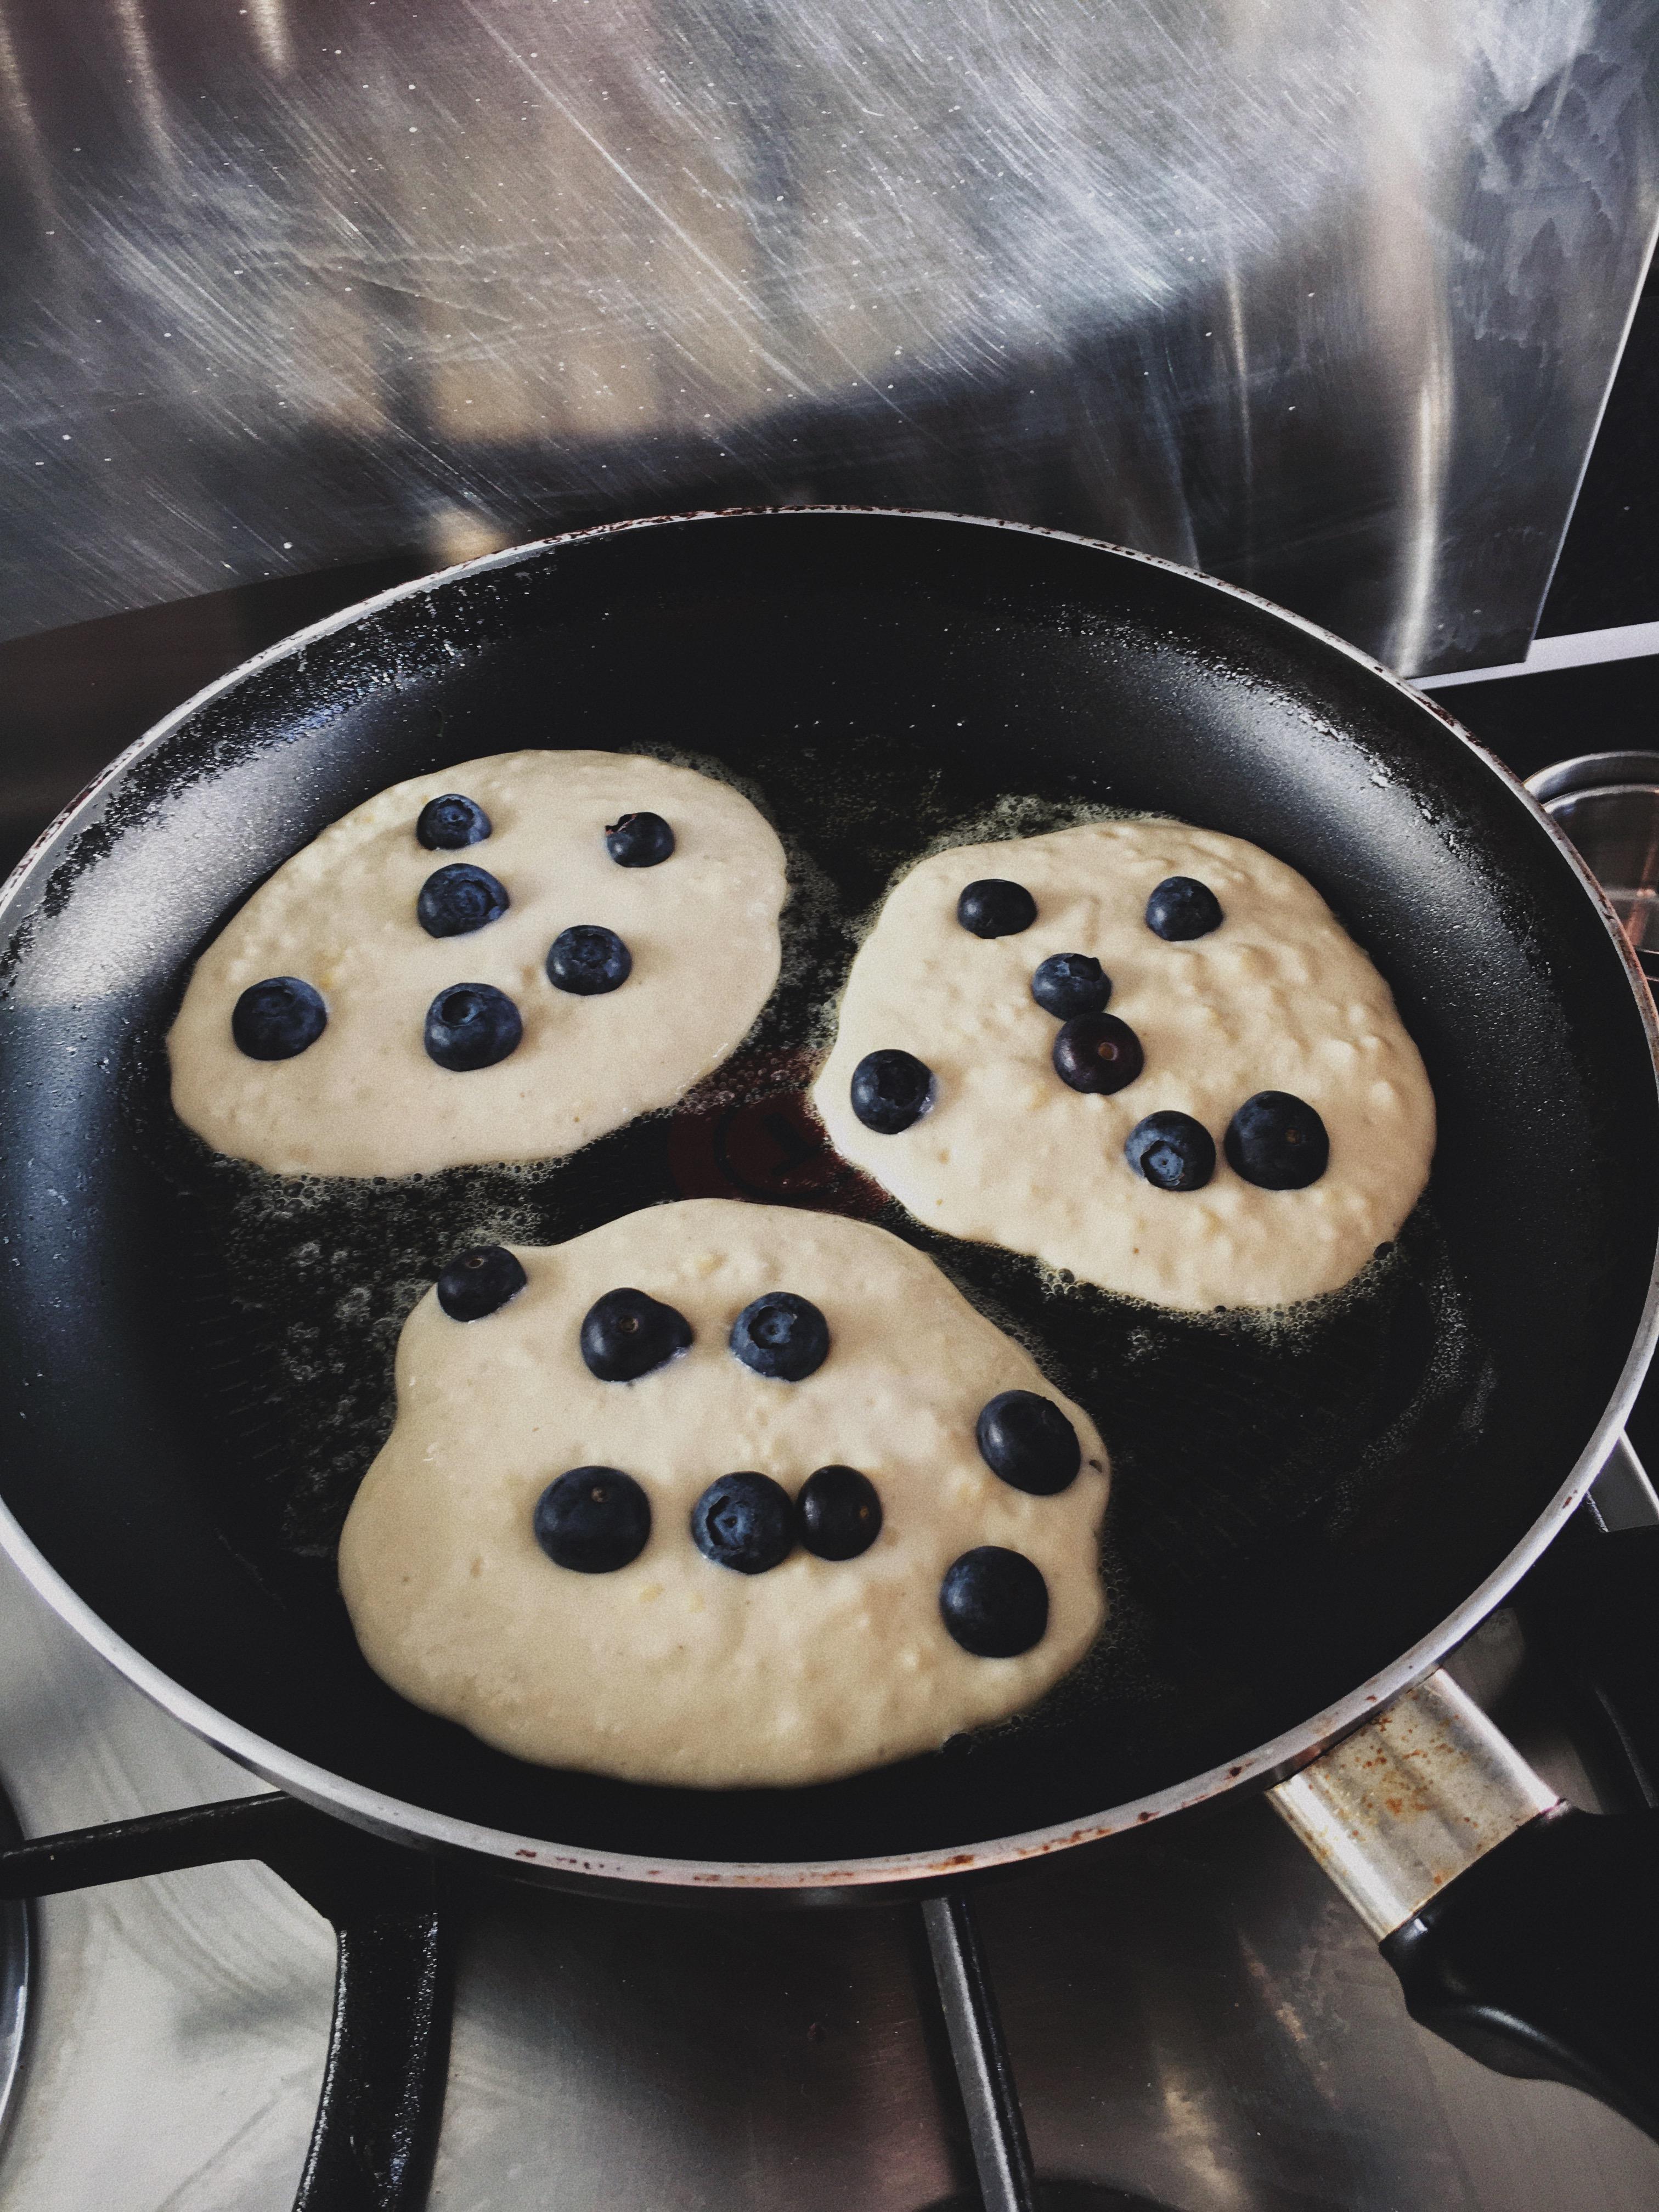 blueberry pancakes recipe buttermilk pancakes recipe homemade from scratch